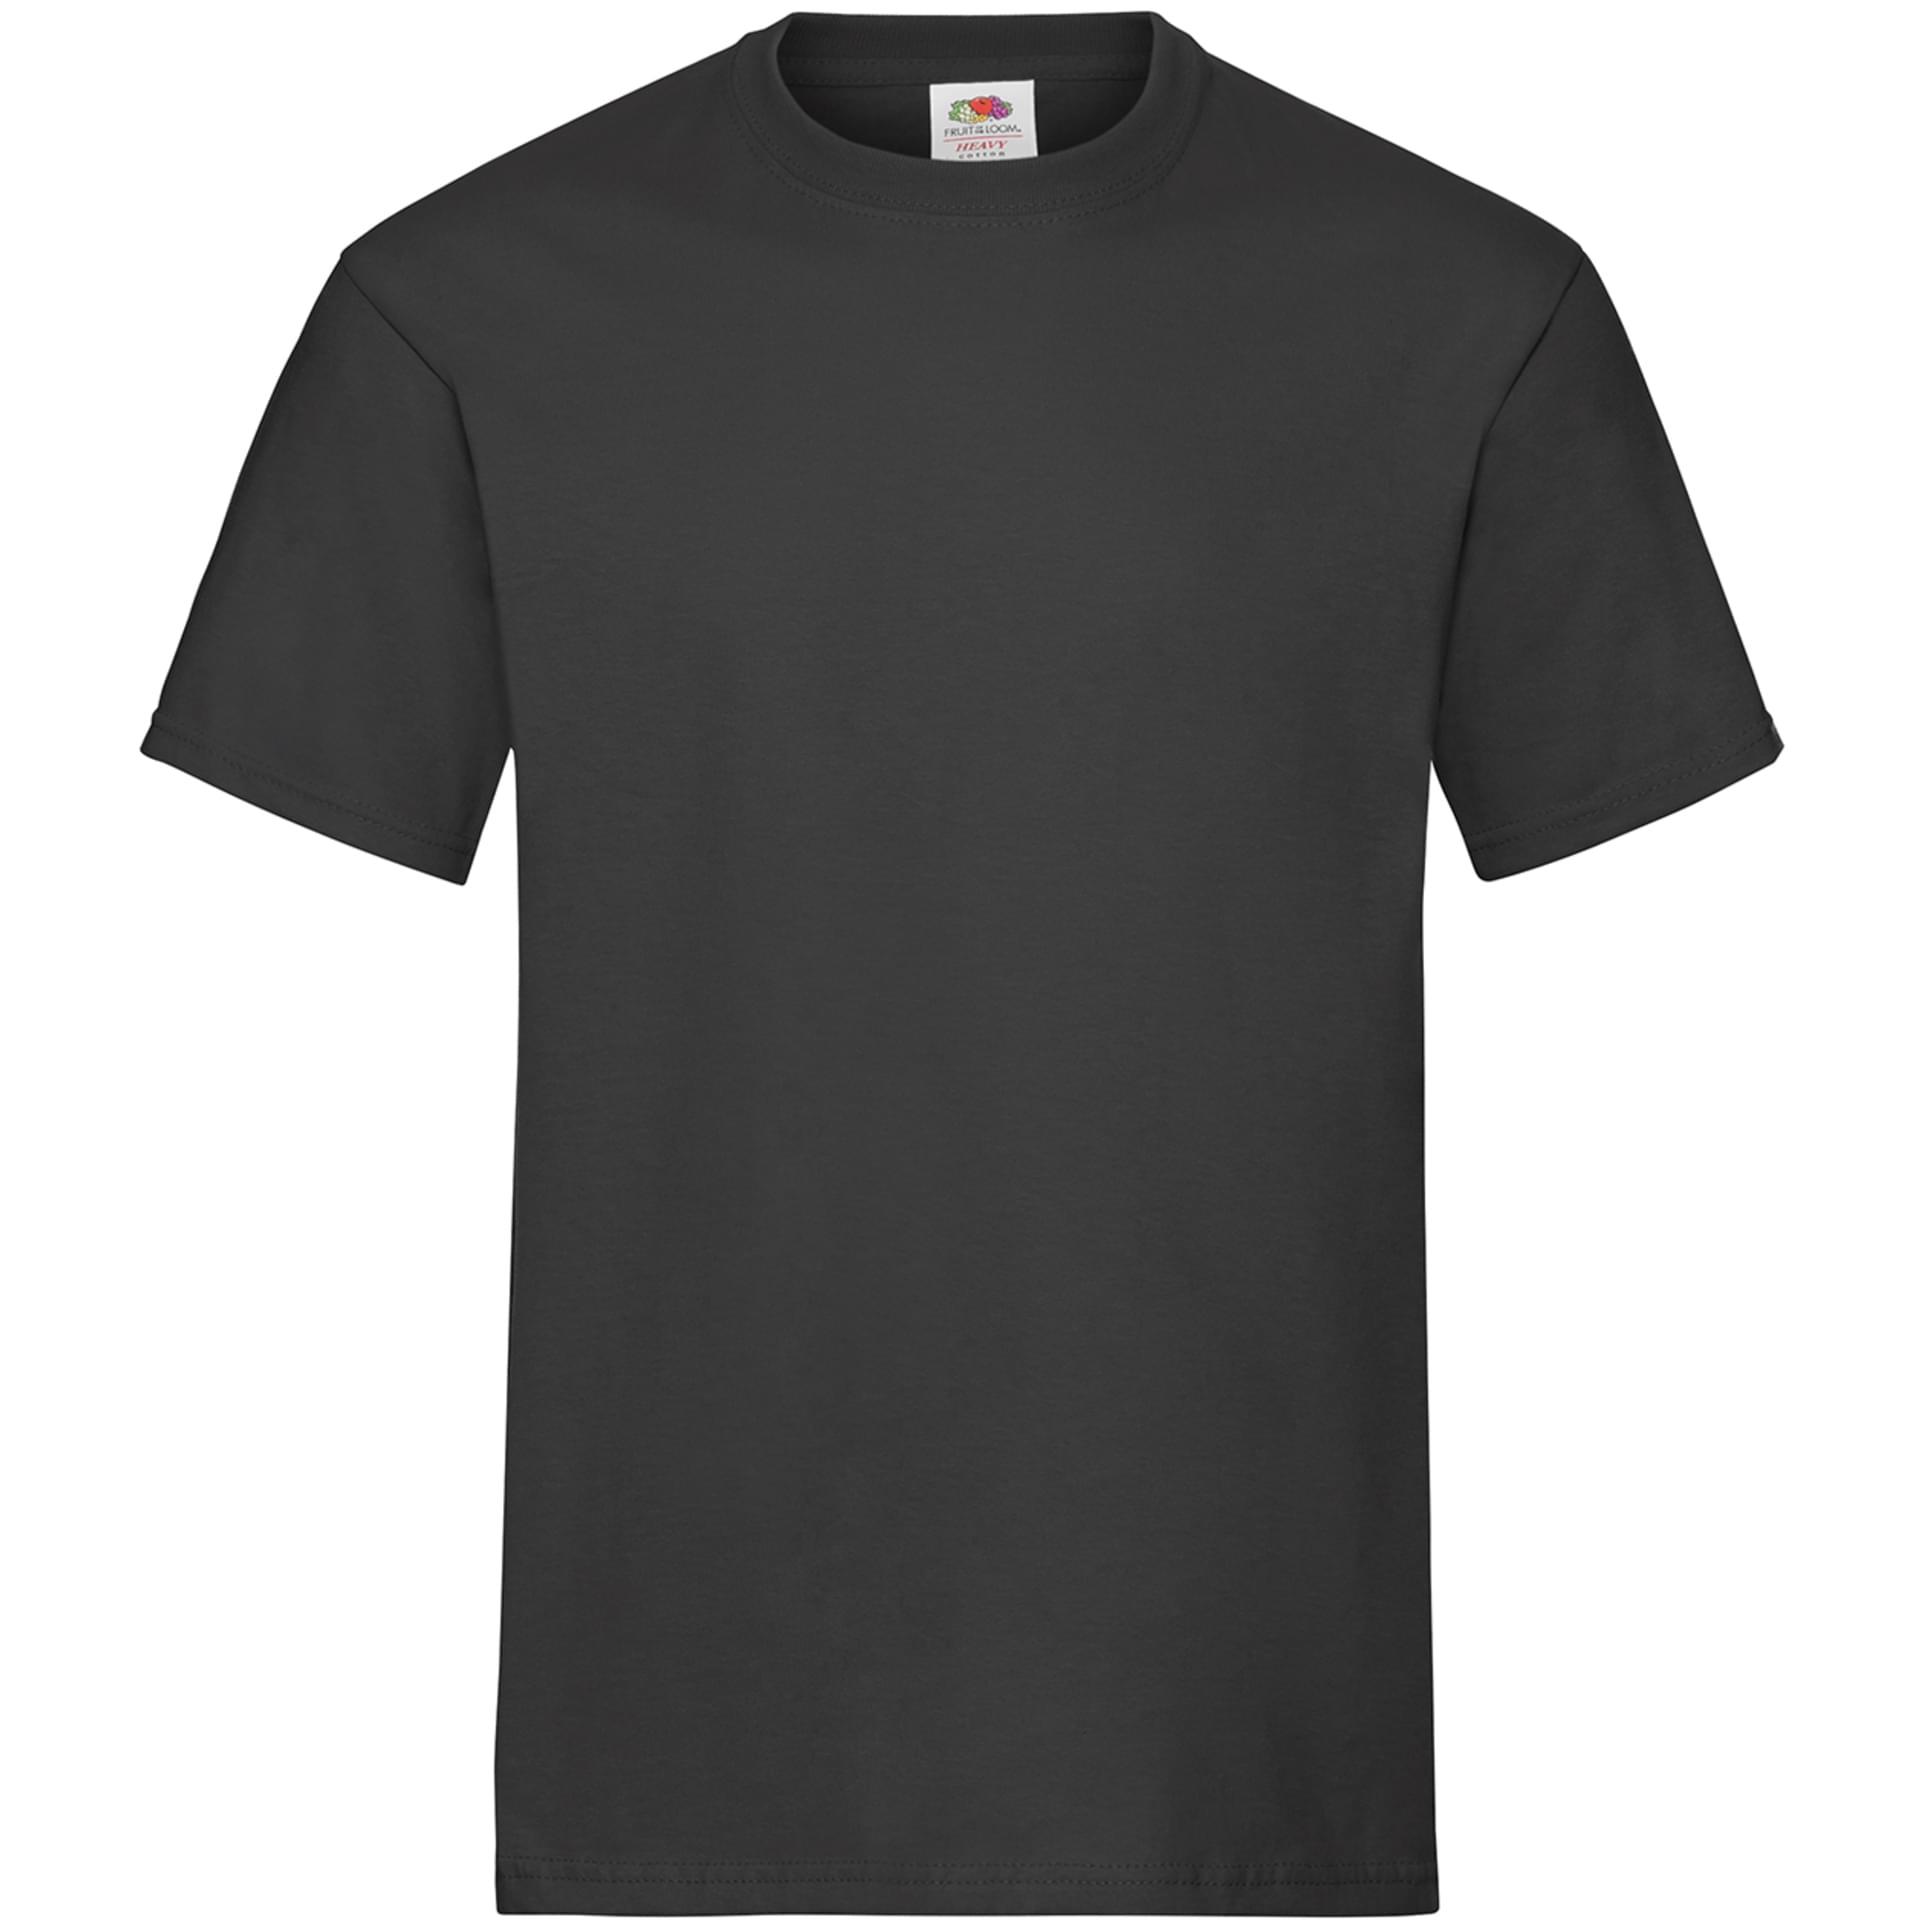 tee shirt personnalis heavy cotton t fruit of the loom noir. Black Bedroom Furniture Sets. Home Design Ideas